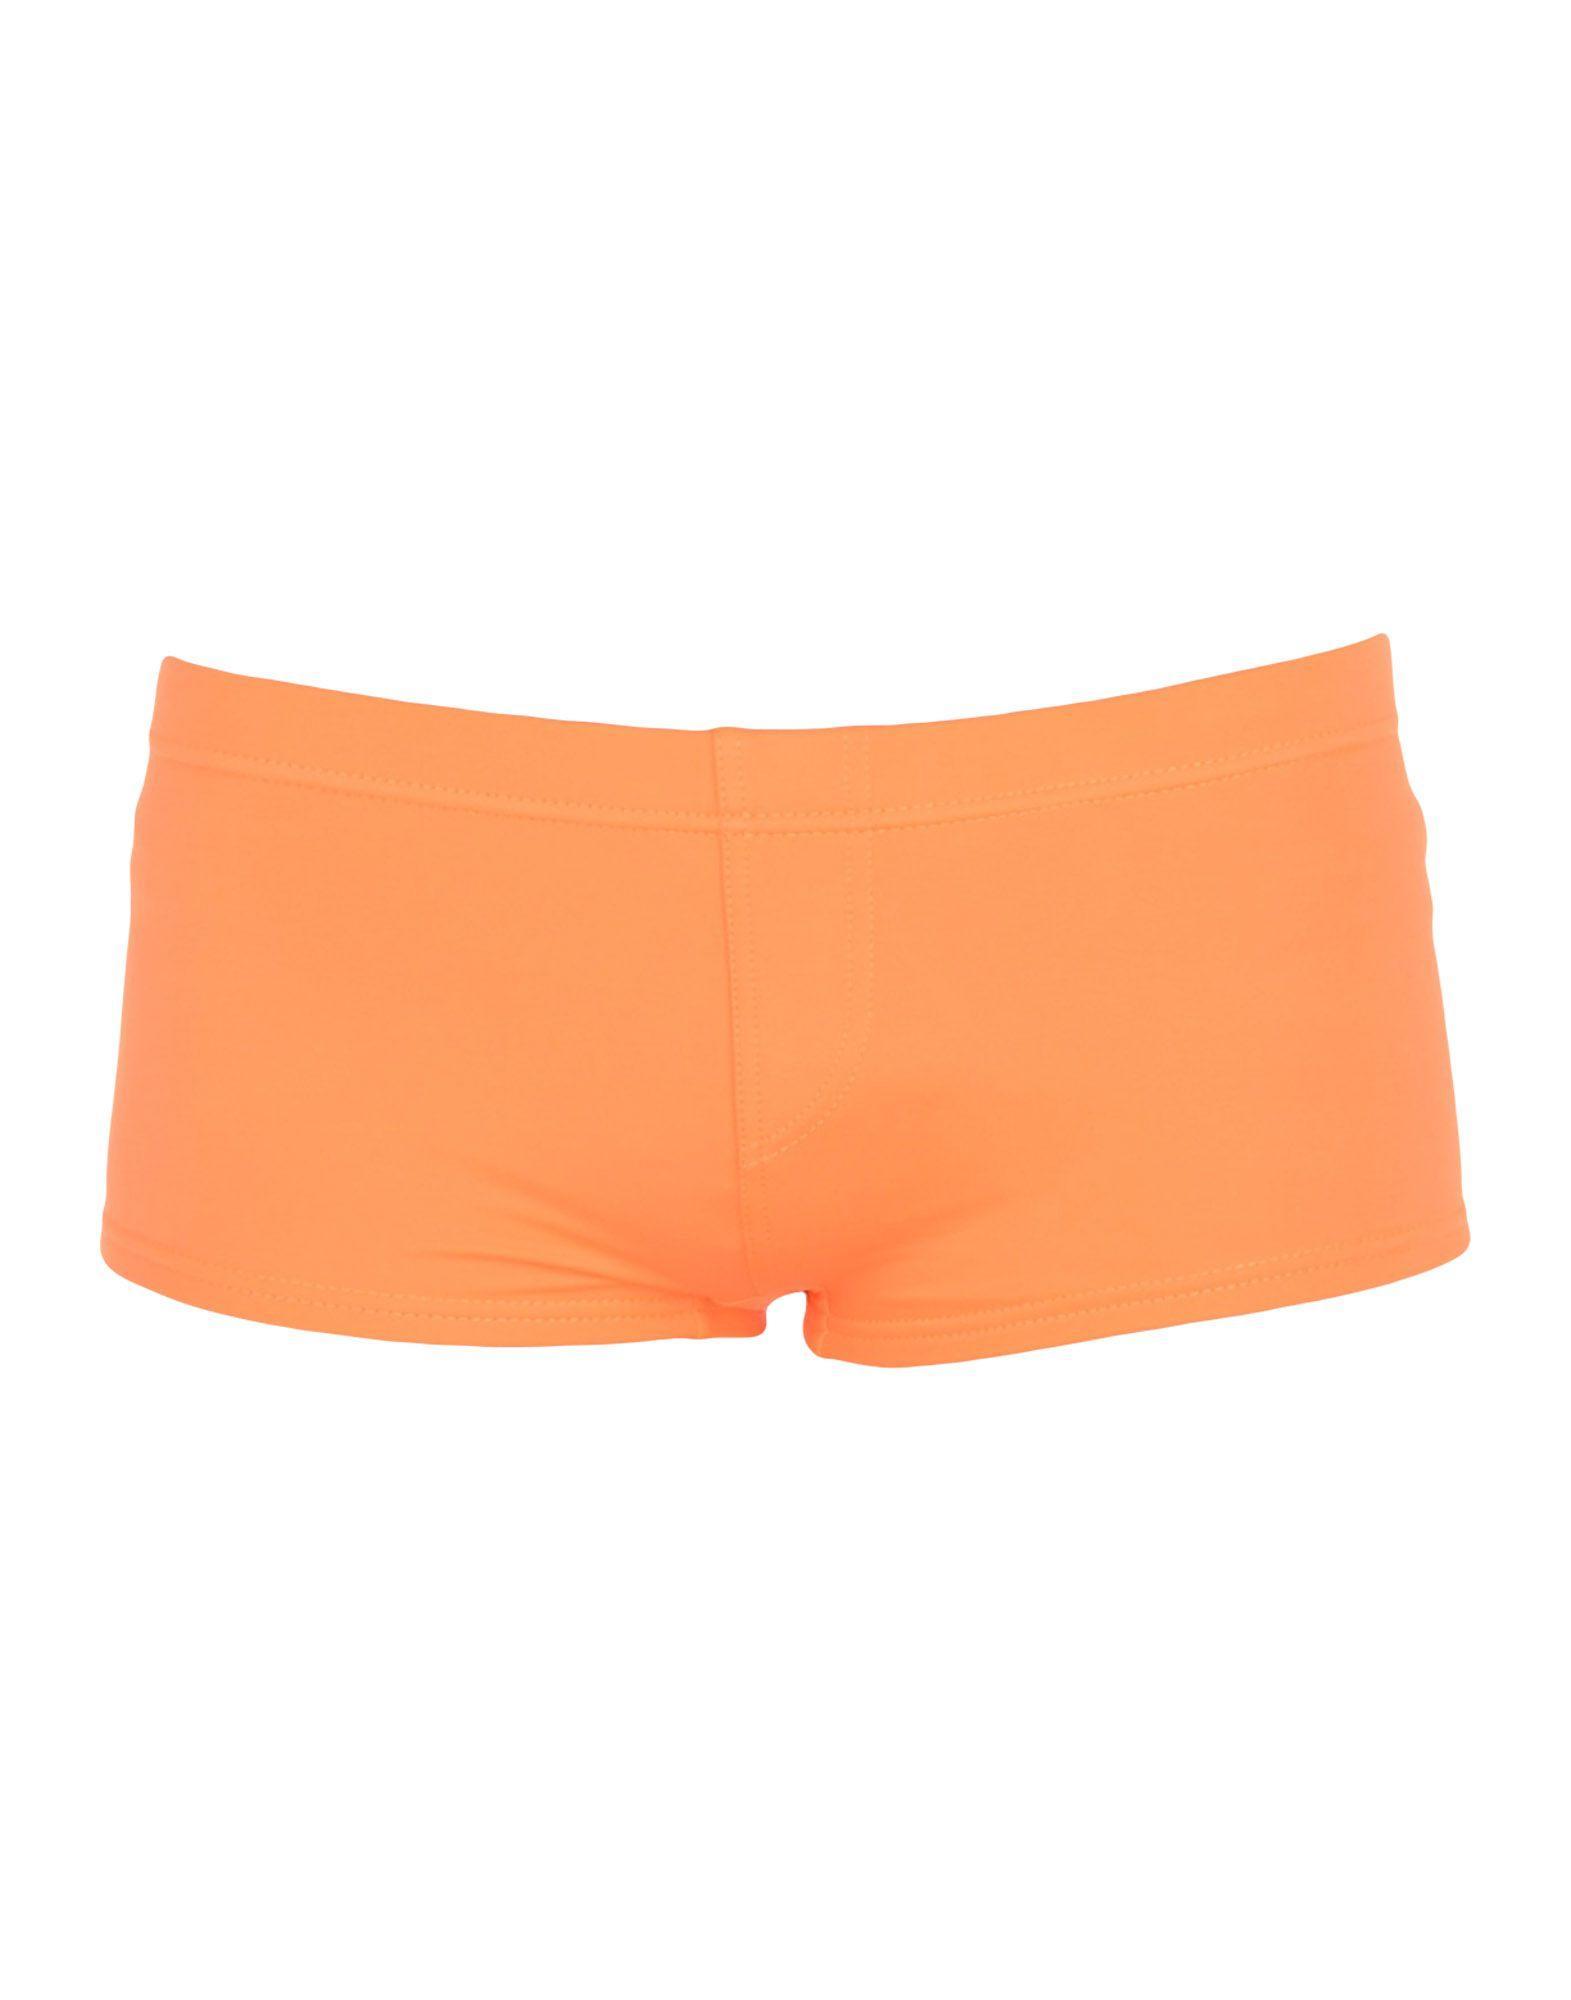 ed96d9afb1 Dsquared2 Swim Shorts In Orange | ModeSens